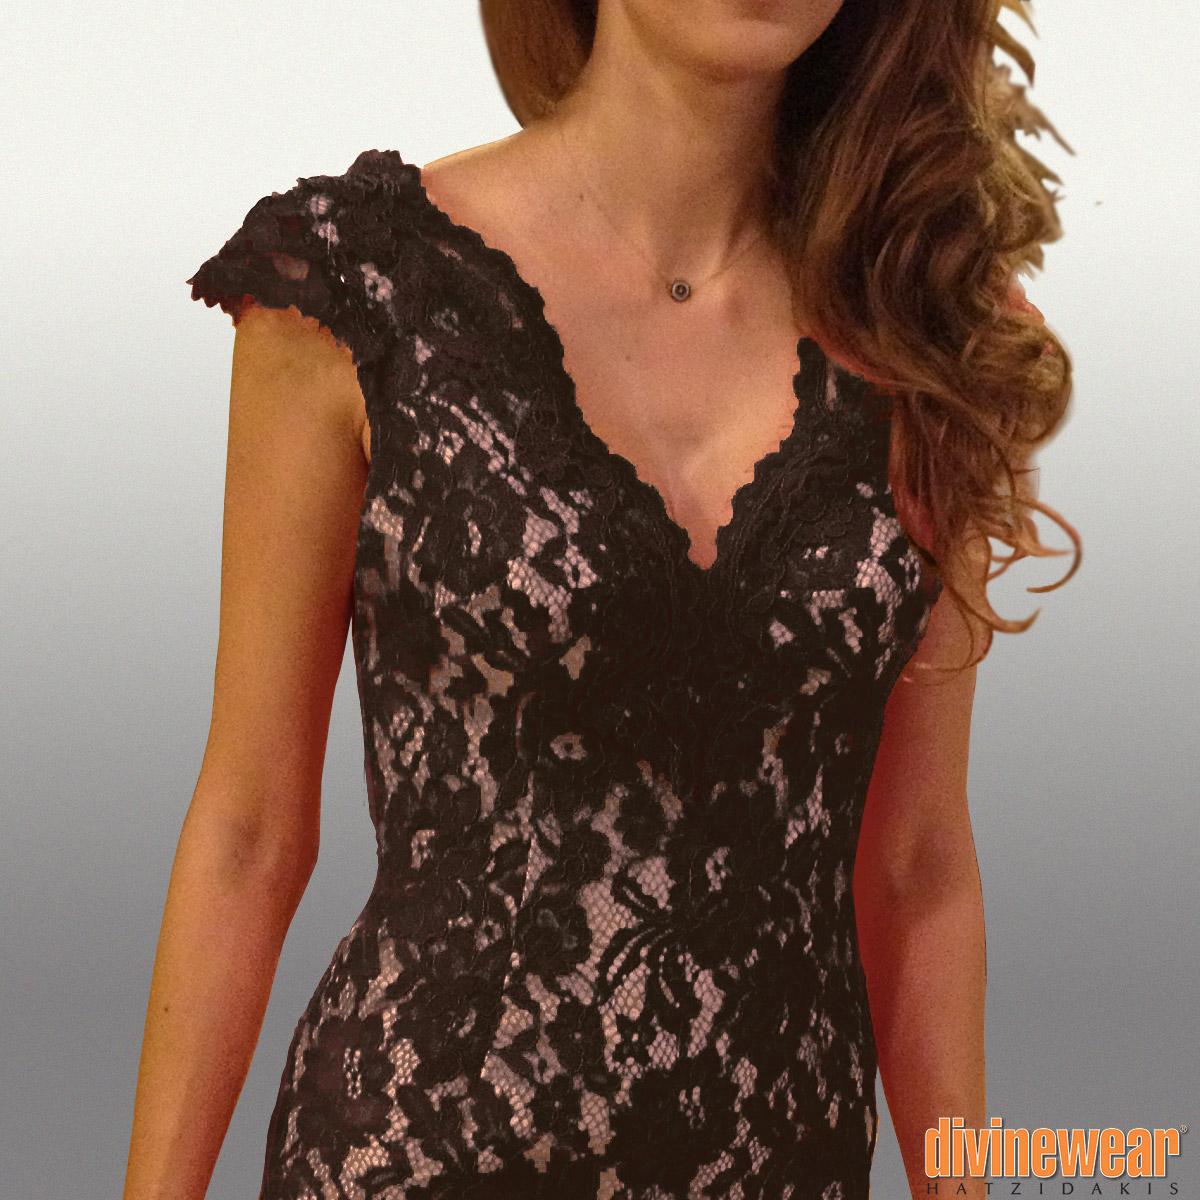 dw_red_dress02_k